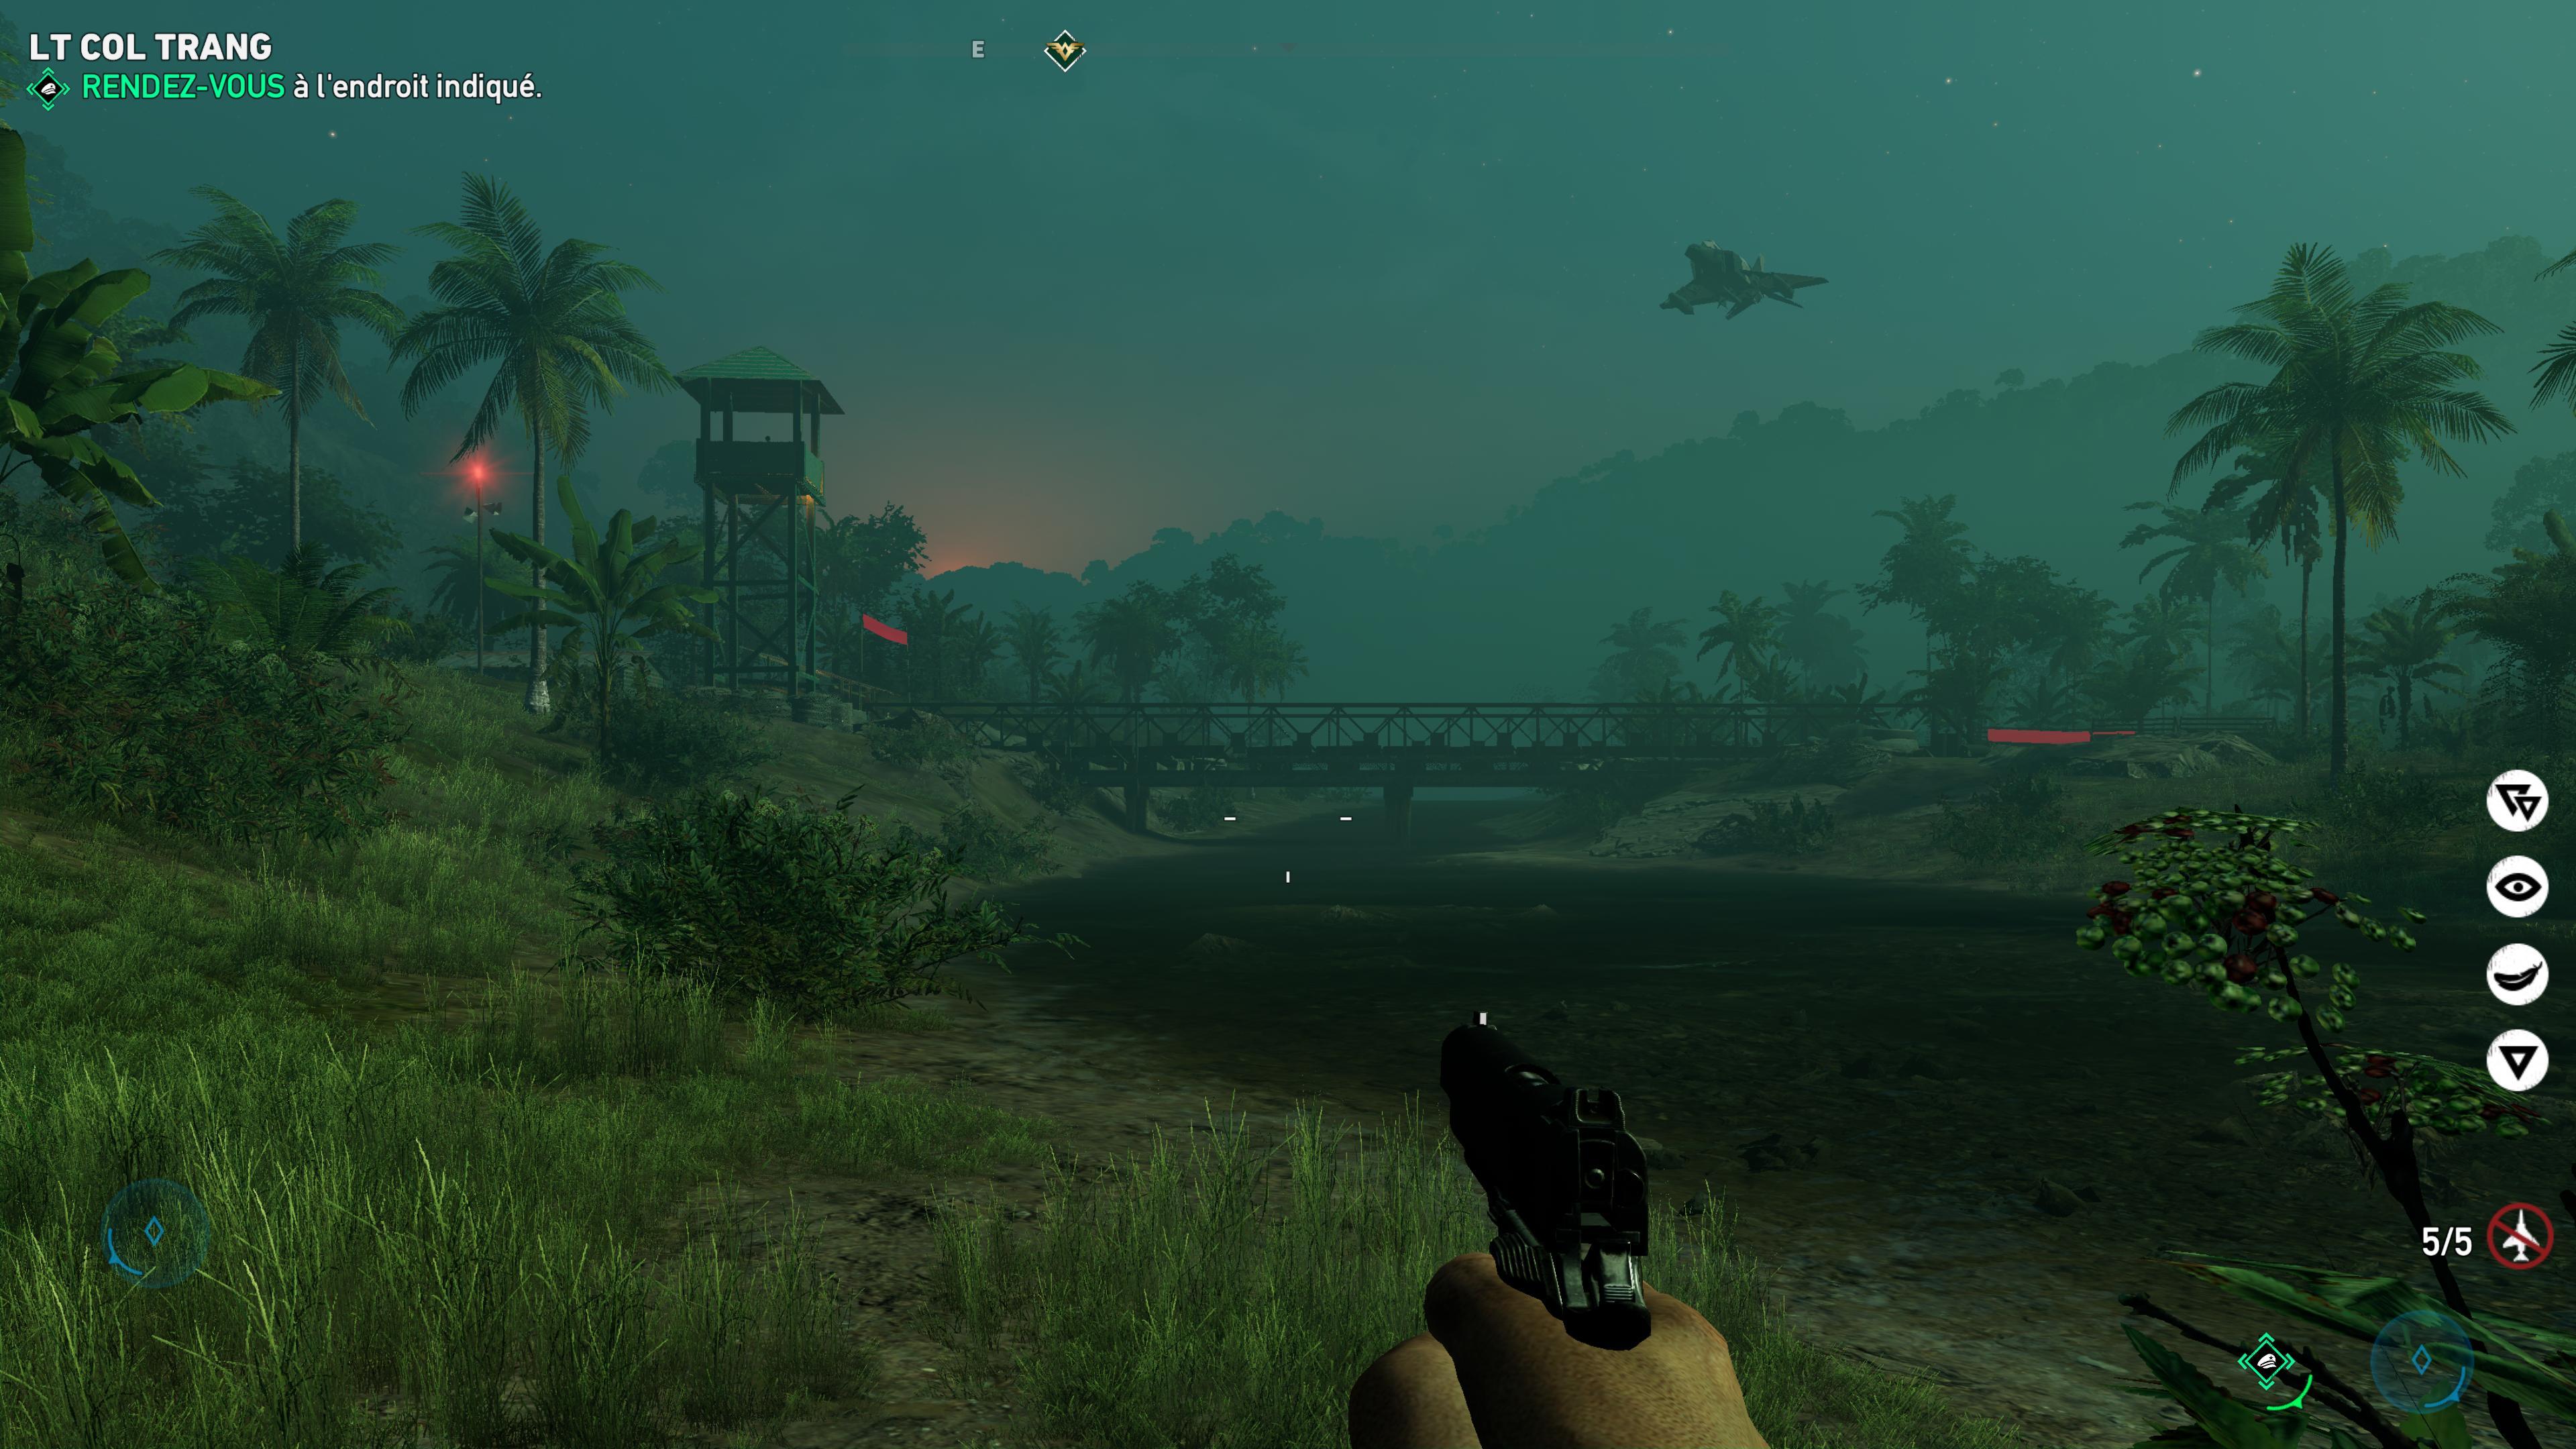 Far Cry 5 Dlc Vietnam Landscape By Ladyrosedoffy On Deviantart